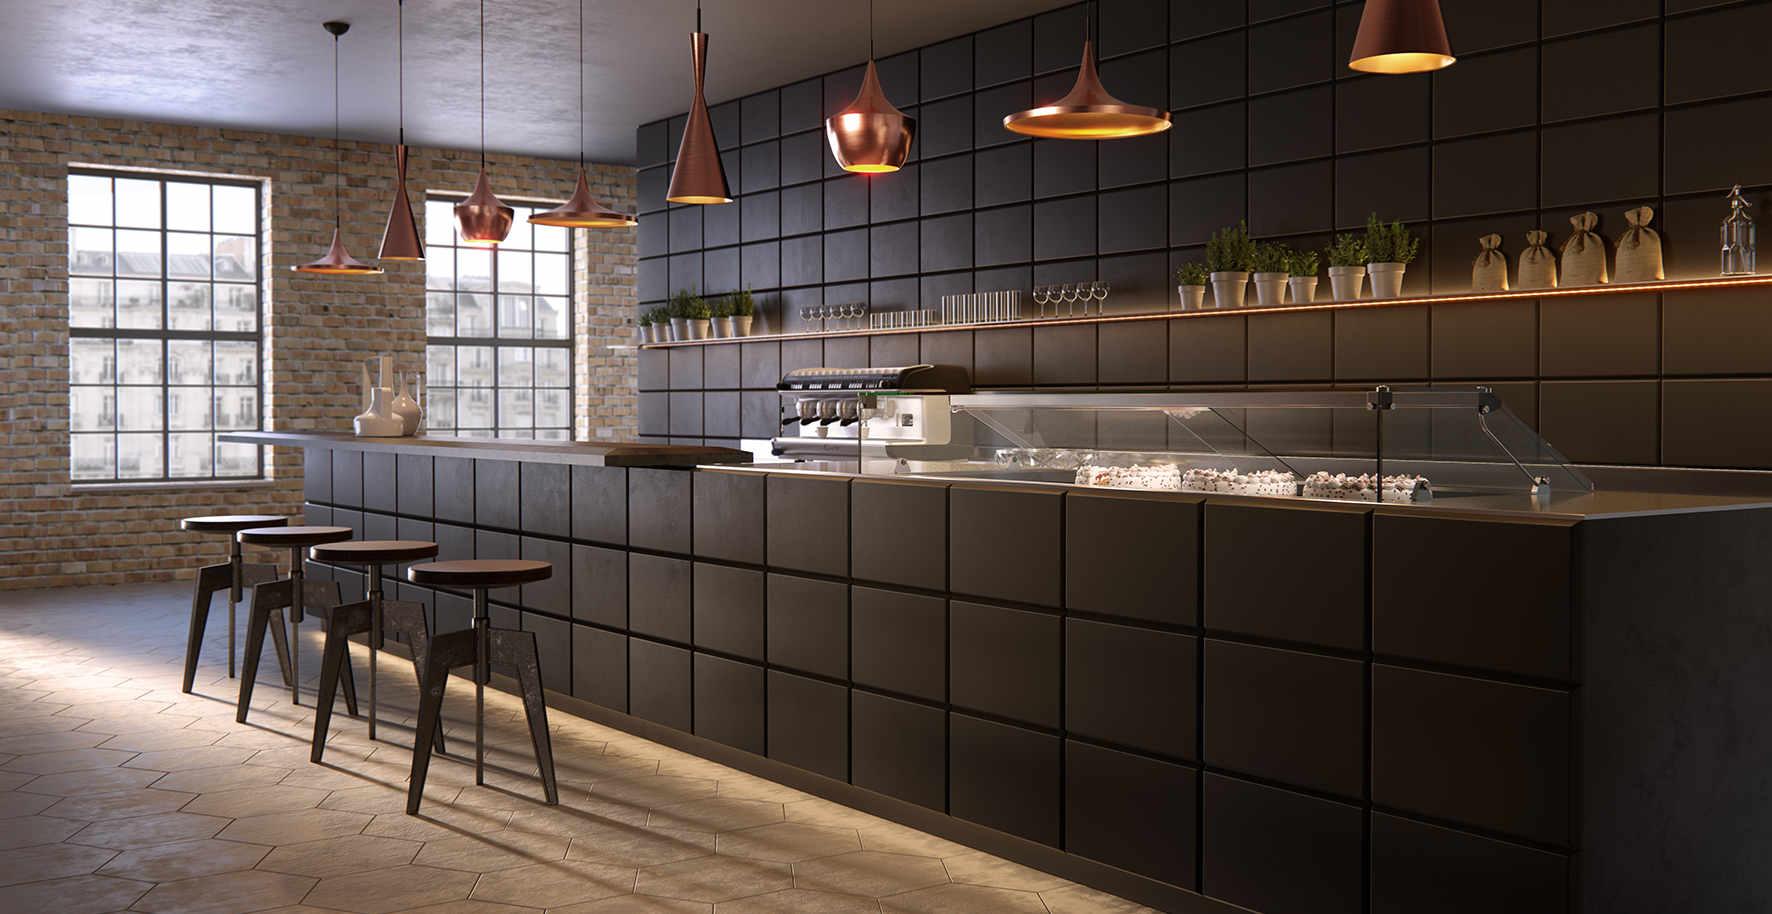 Arredi Bar Moderni banco bar tabula rasa per un arredo completo | arredo bar